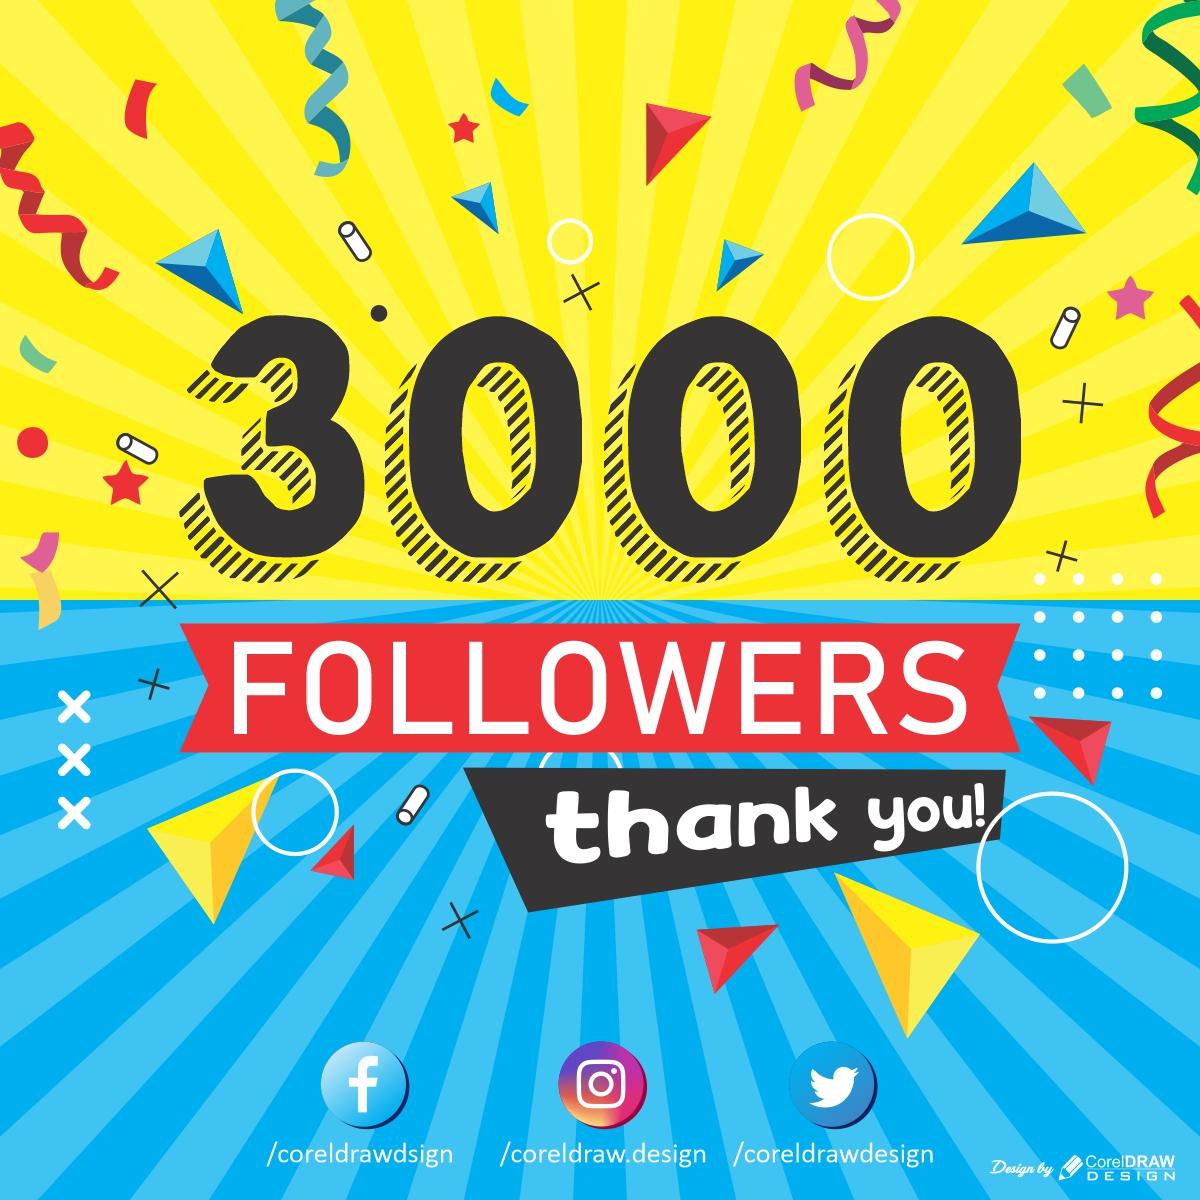 3k Followers Thank you CDR template